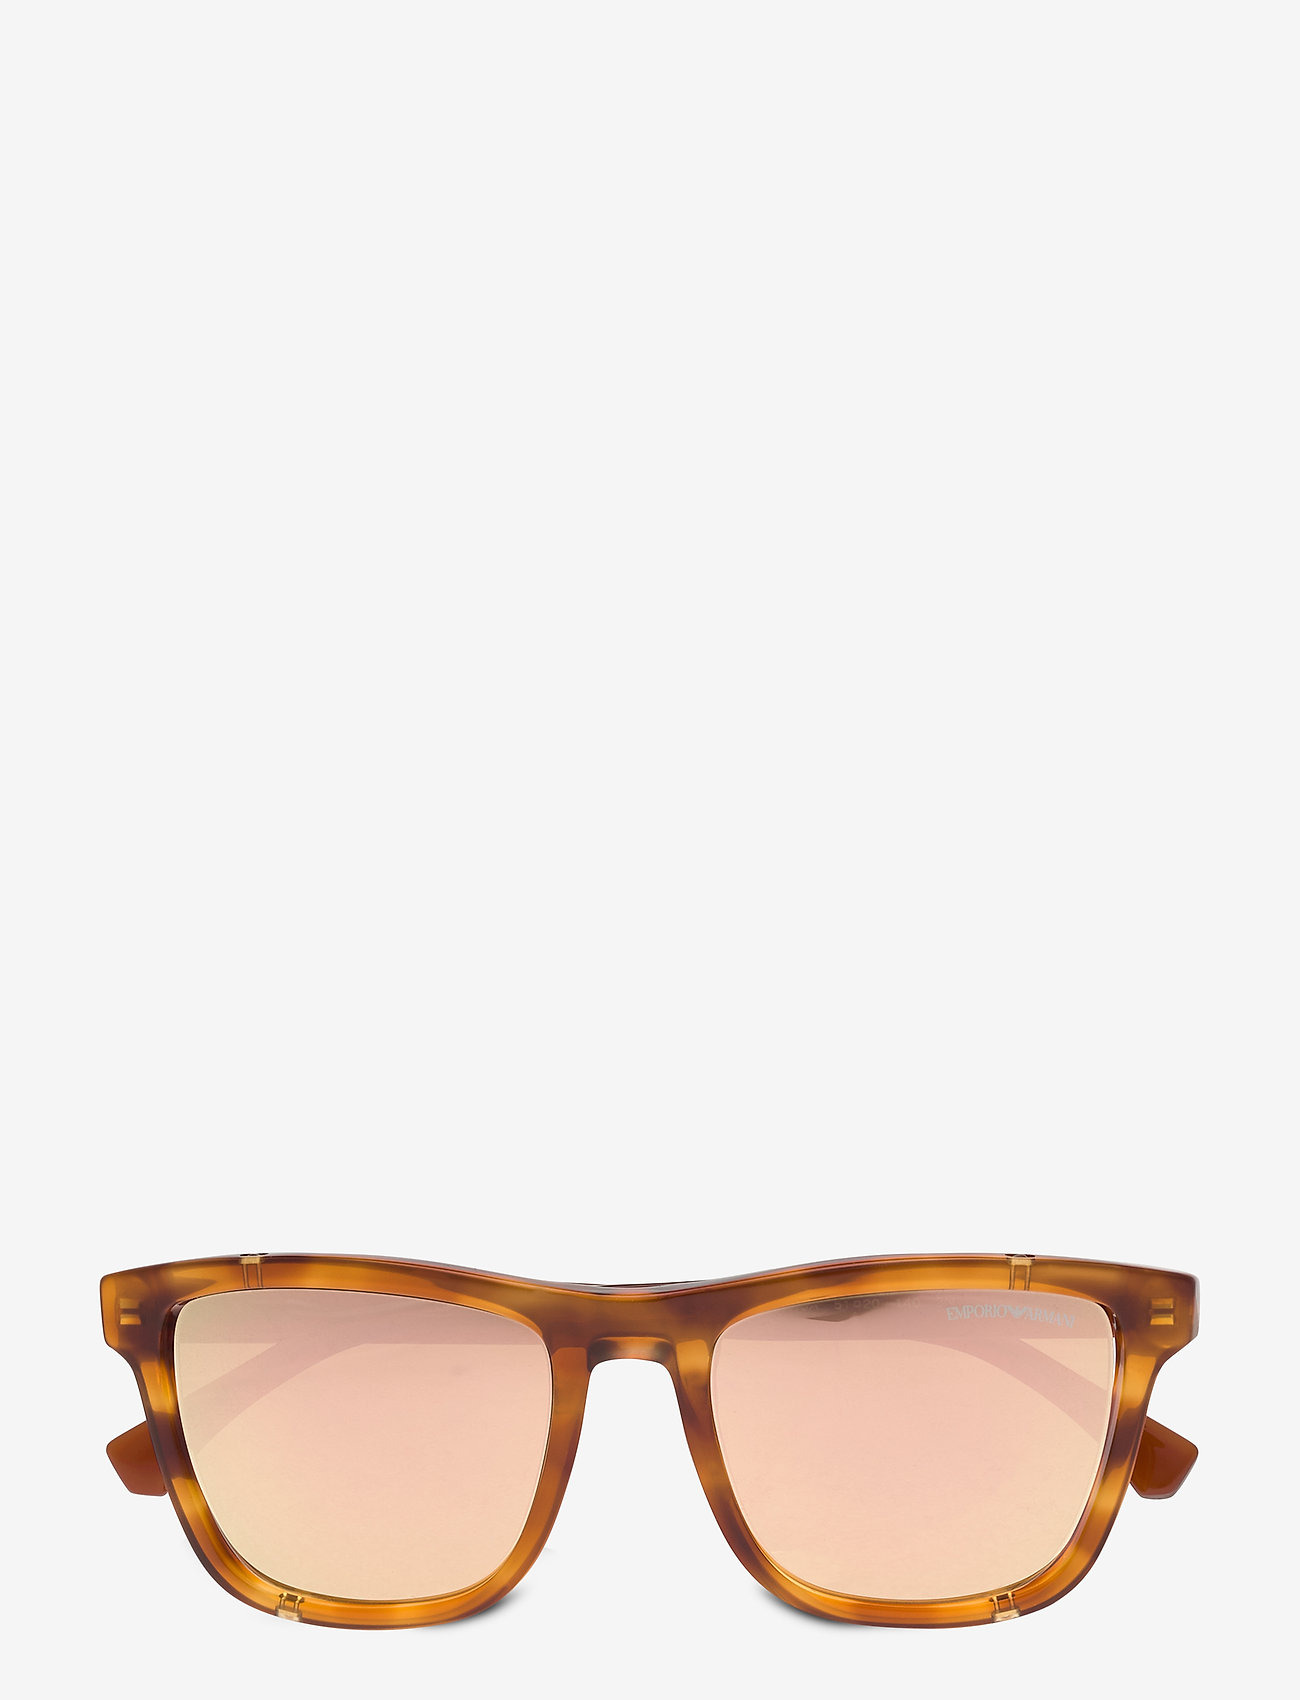 Emporio Armani Sunglasses - 0EA4126 - d-shaped - blonde havana - 0